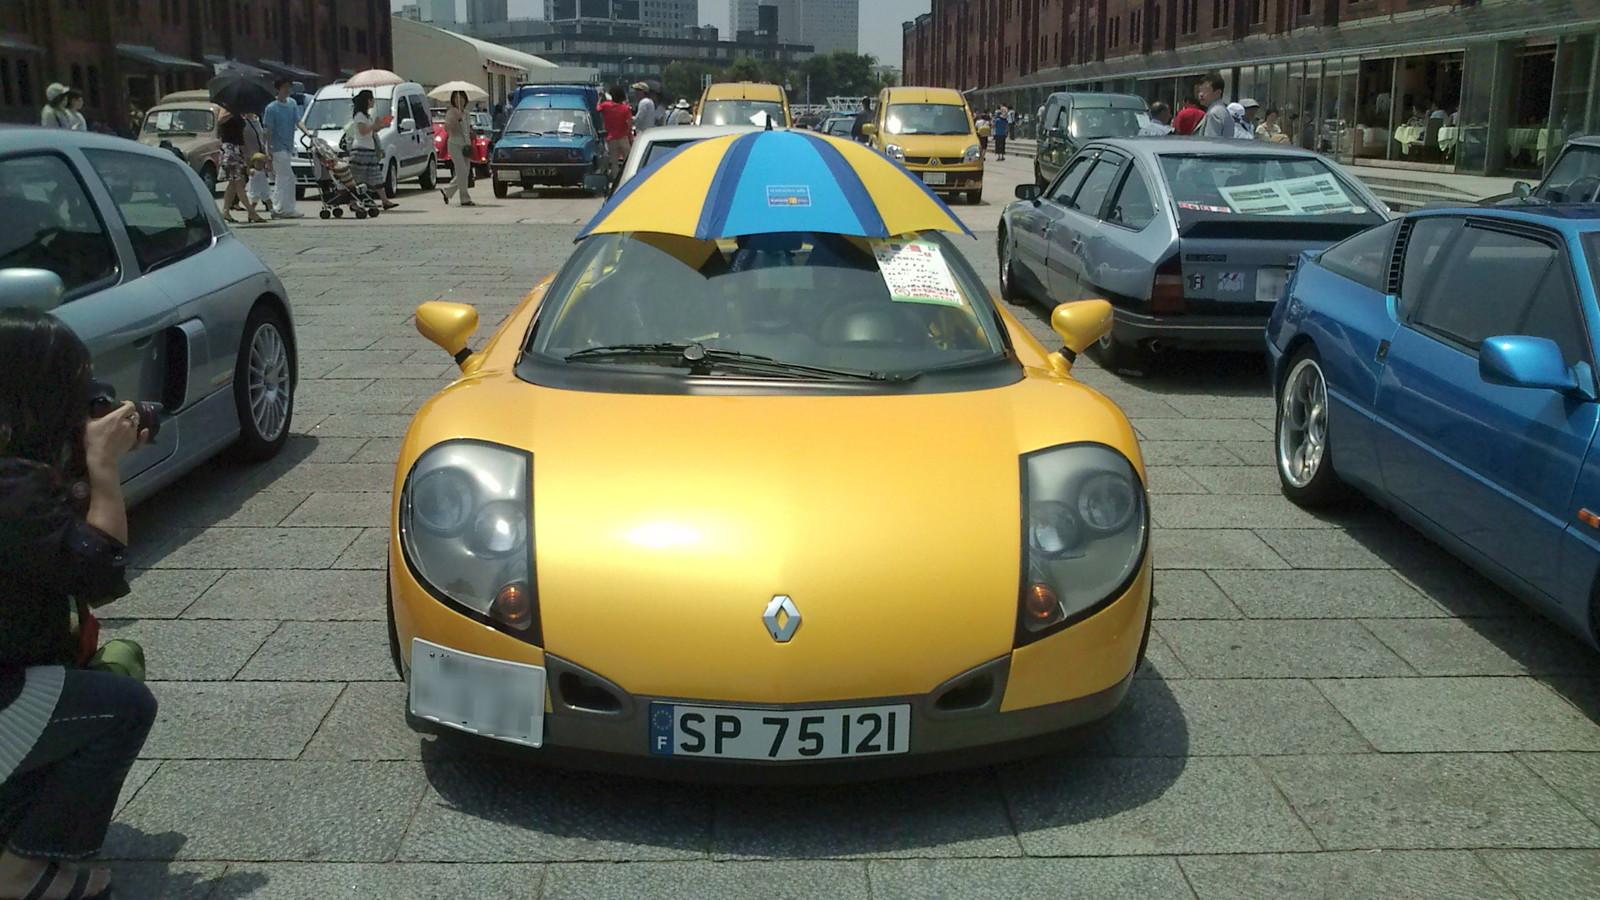 F1000048